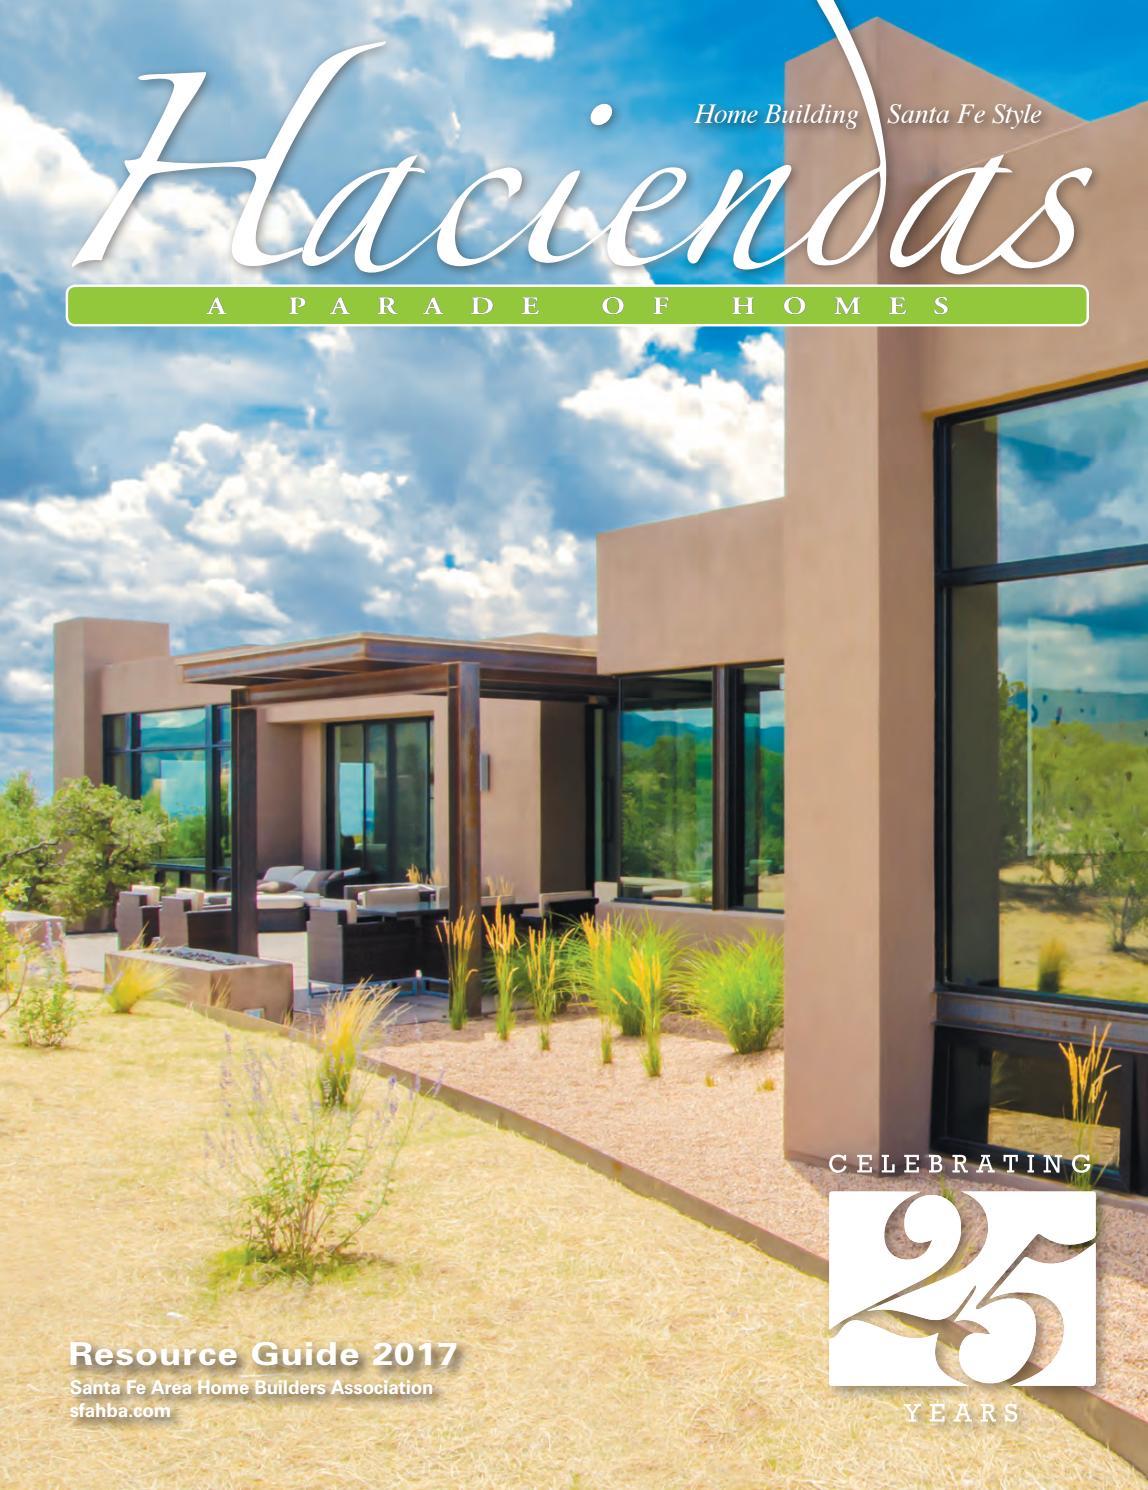 Haciendas summer 2017 digital edition by bella media group issuu jeuxipadfo Image collections